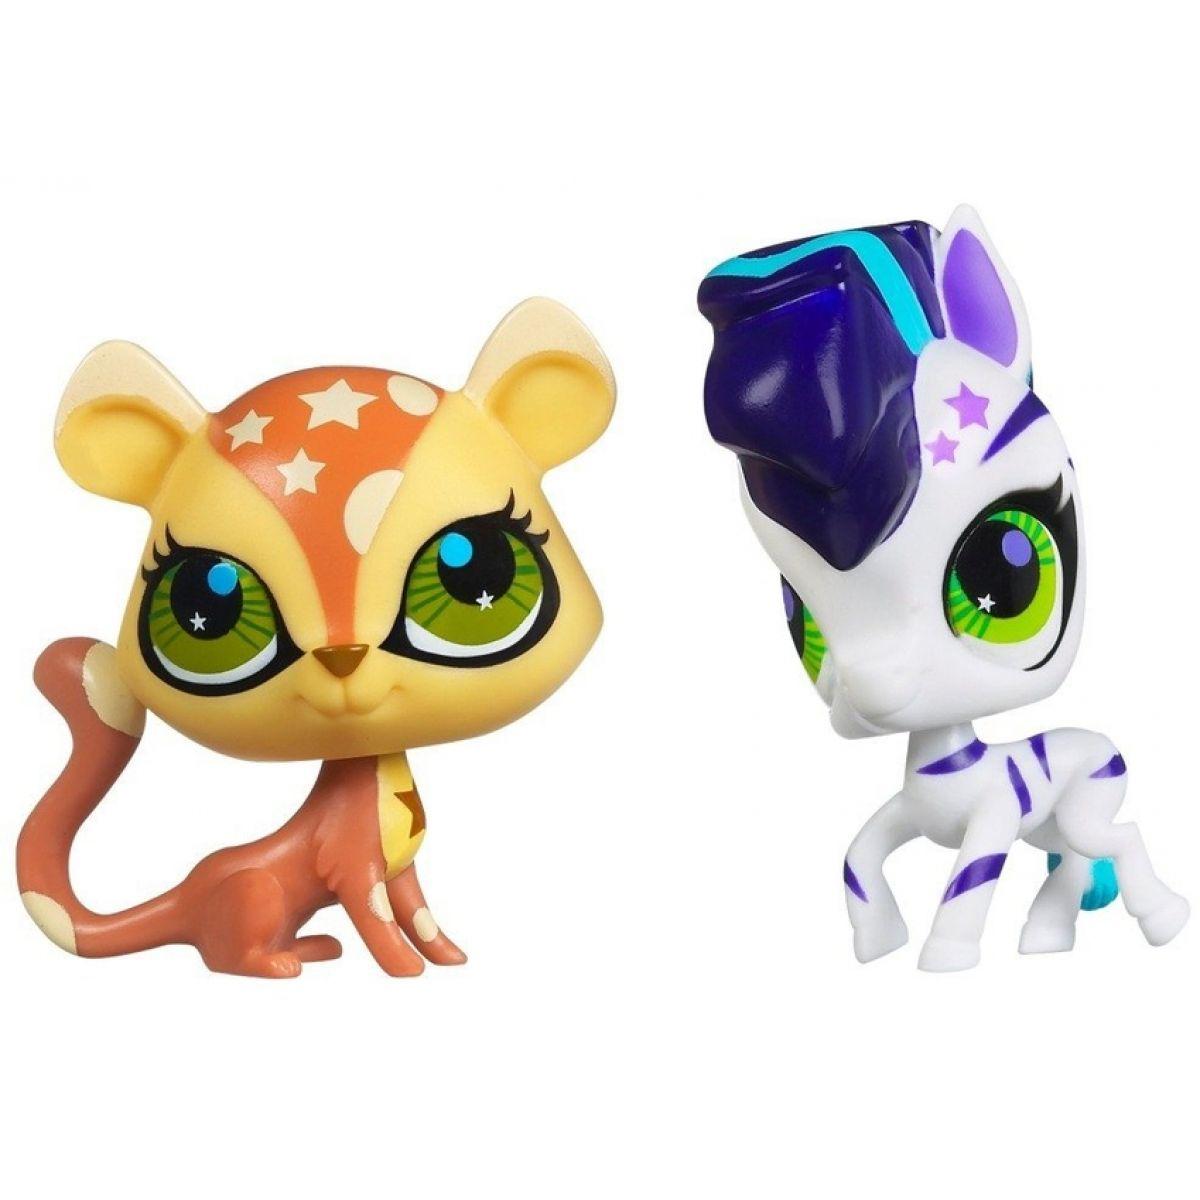 Littlest Pet Shop zvířátka - 2856 Zebra 2857 Gepard